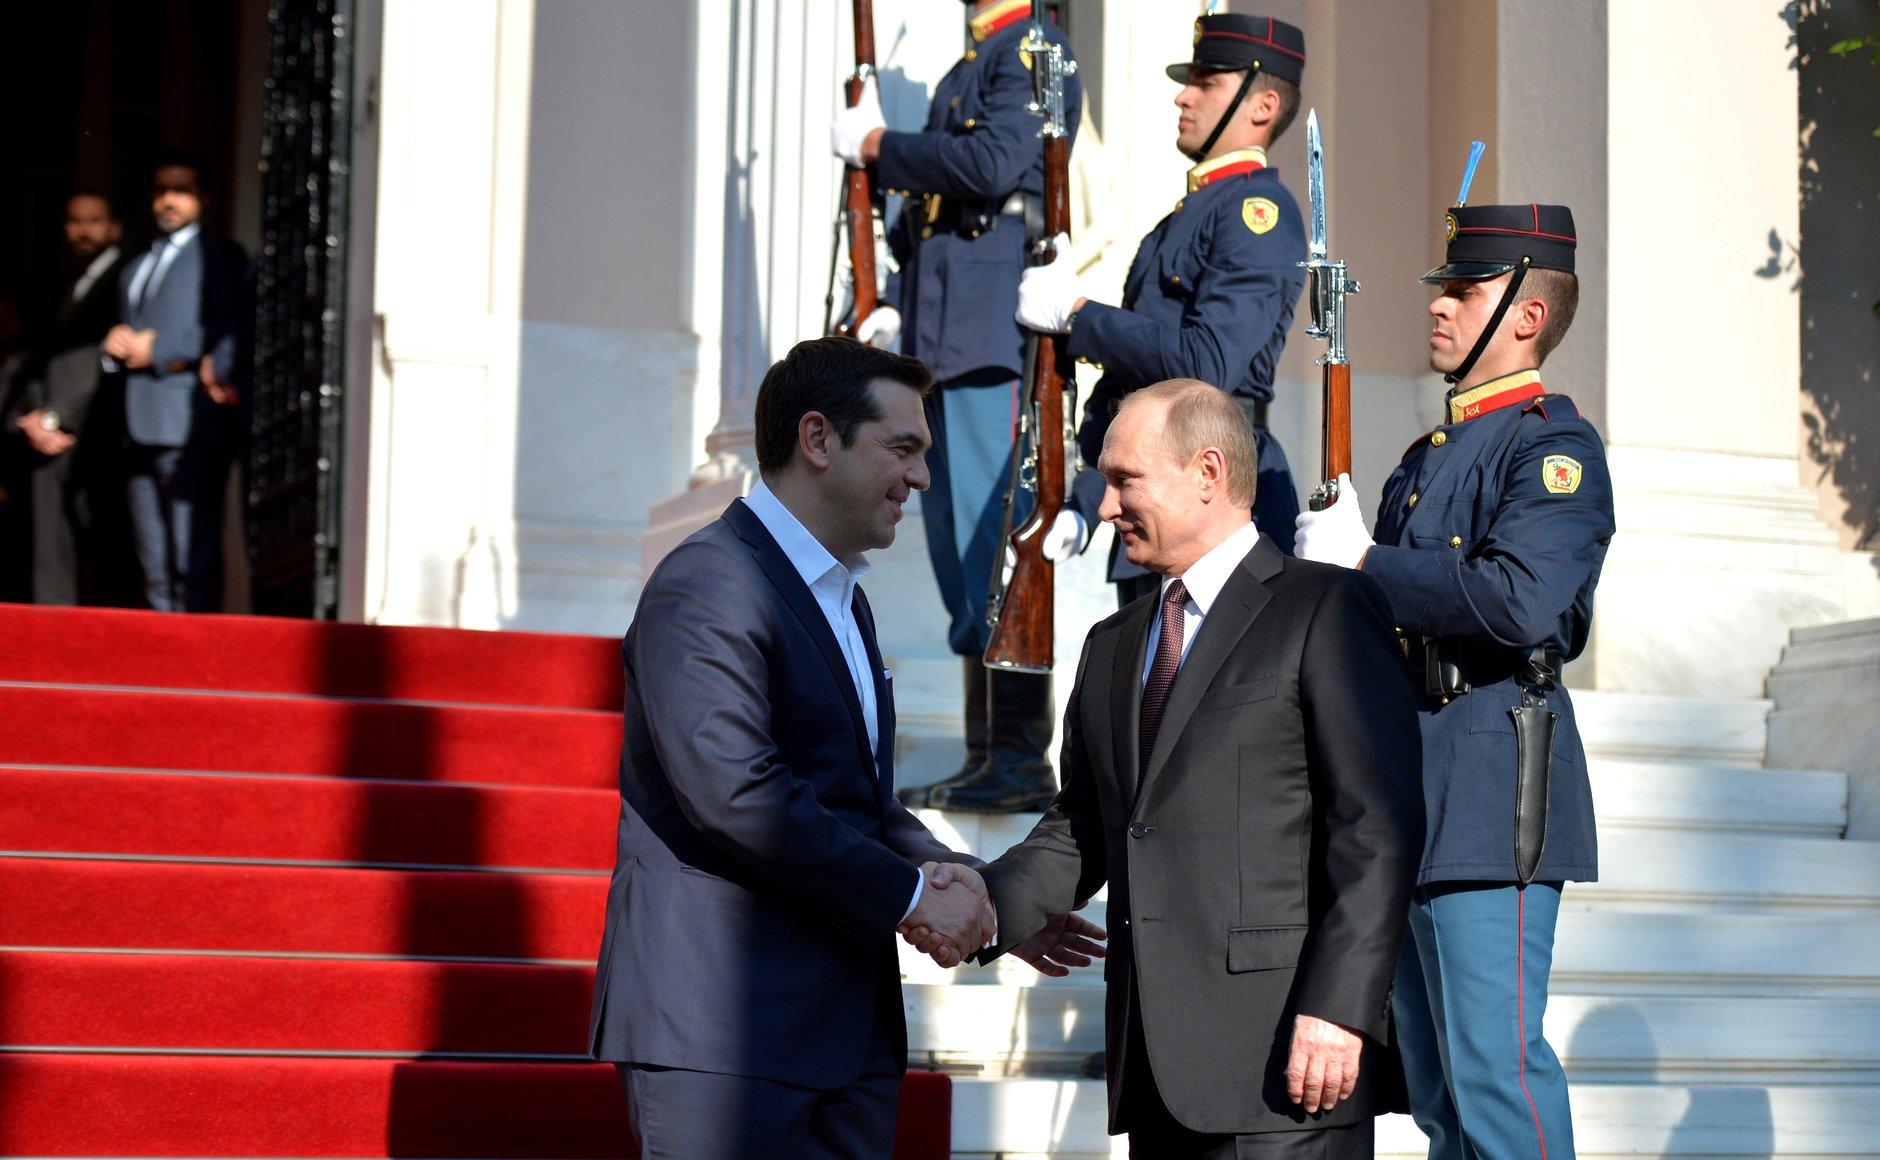 Визит президента РФ В. Путина в Грецию нацелен на укрепление двустороннего сотрудничества